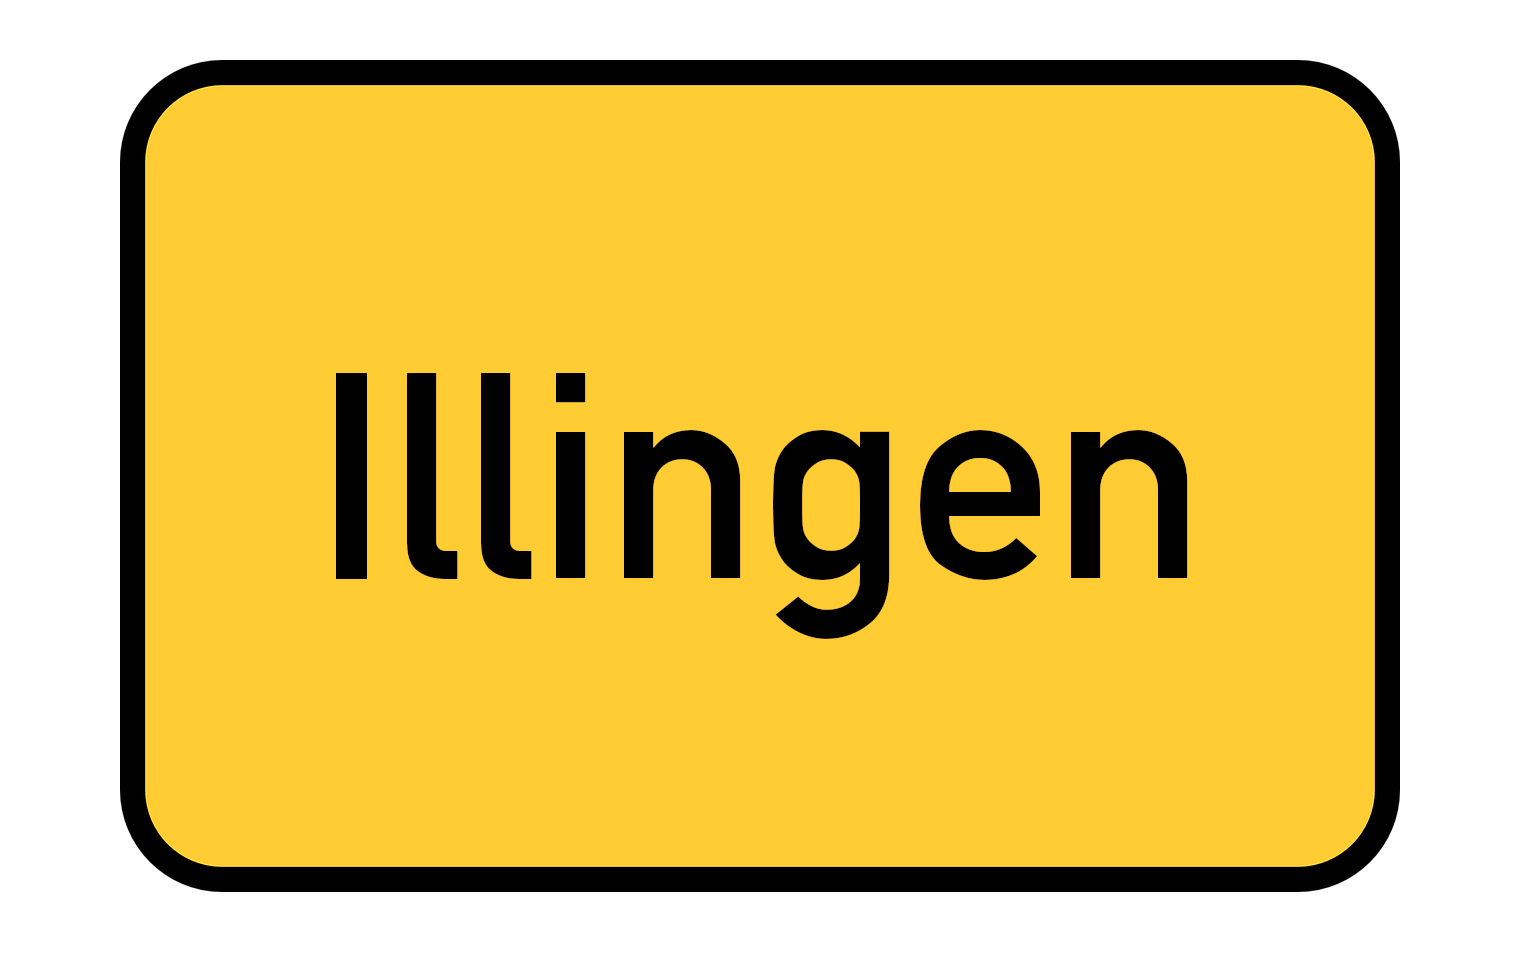 Isotox Schädlingsbekämpfung in Illingen